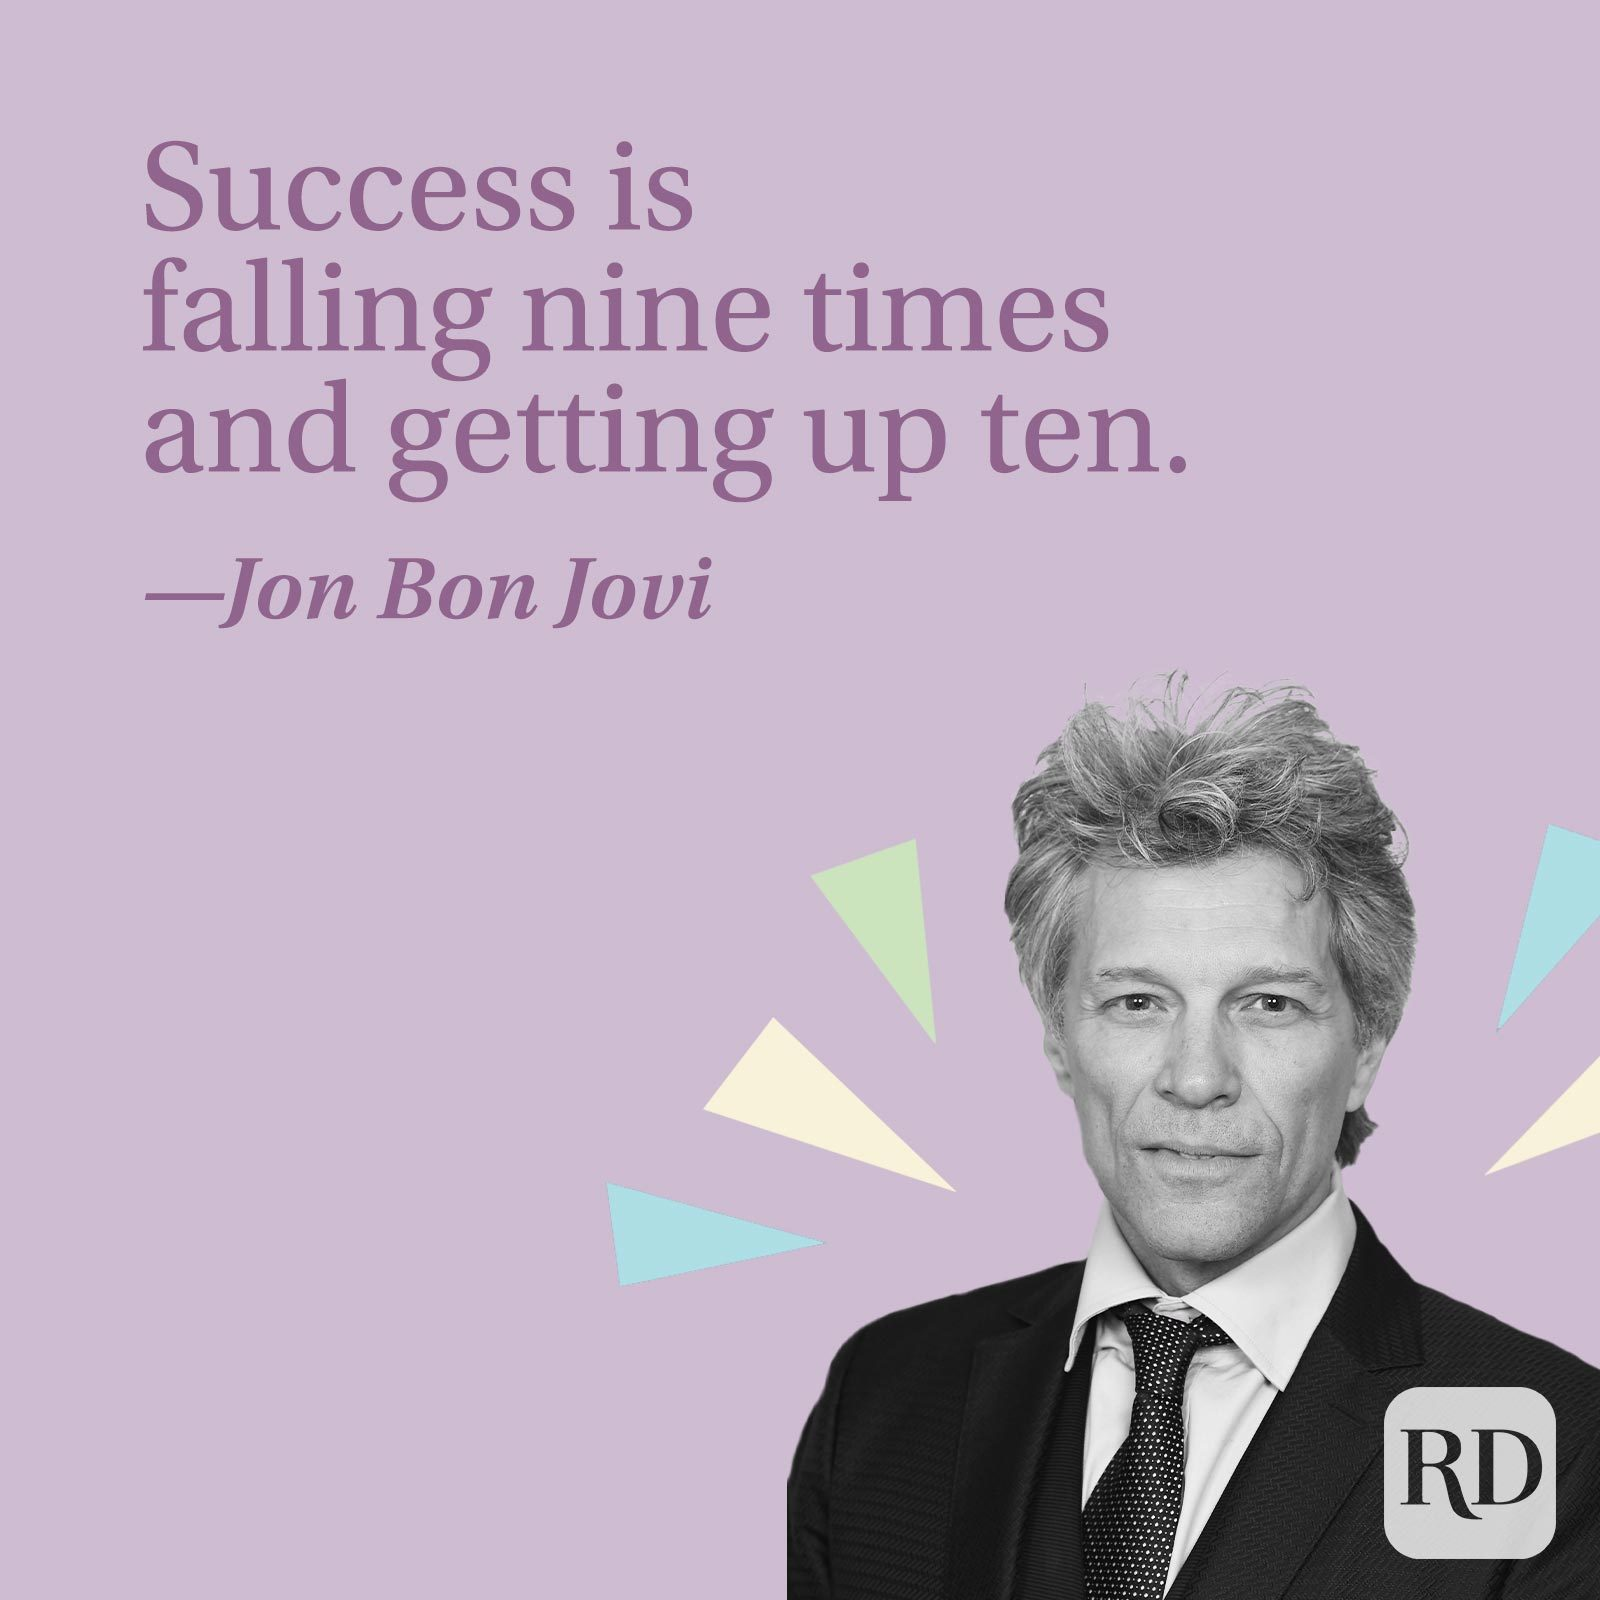 Success is falling nine times and getting up ten.—Jon Bon Jovi